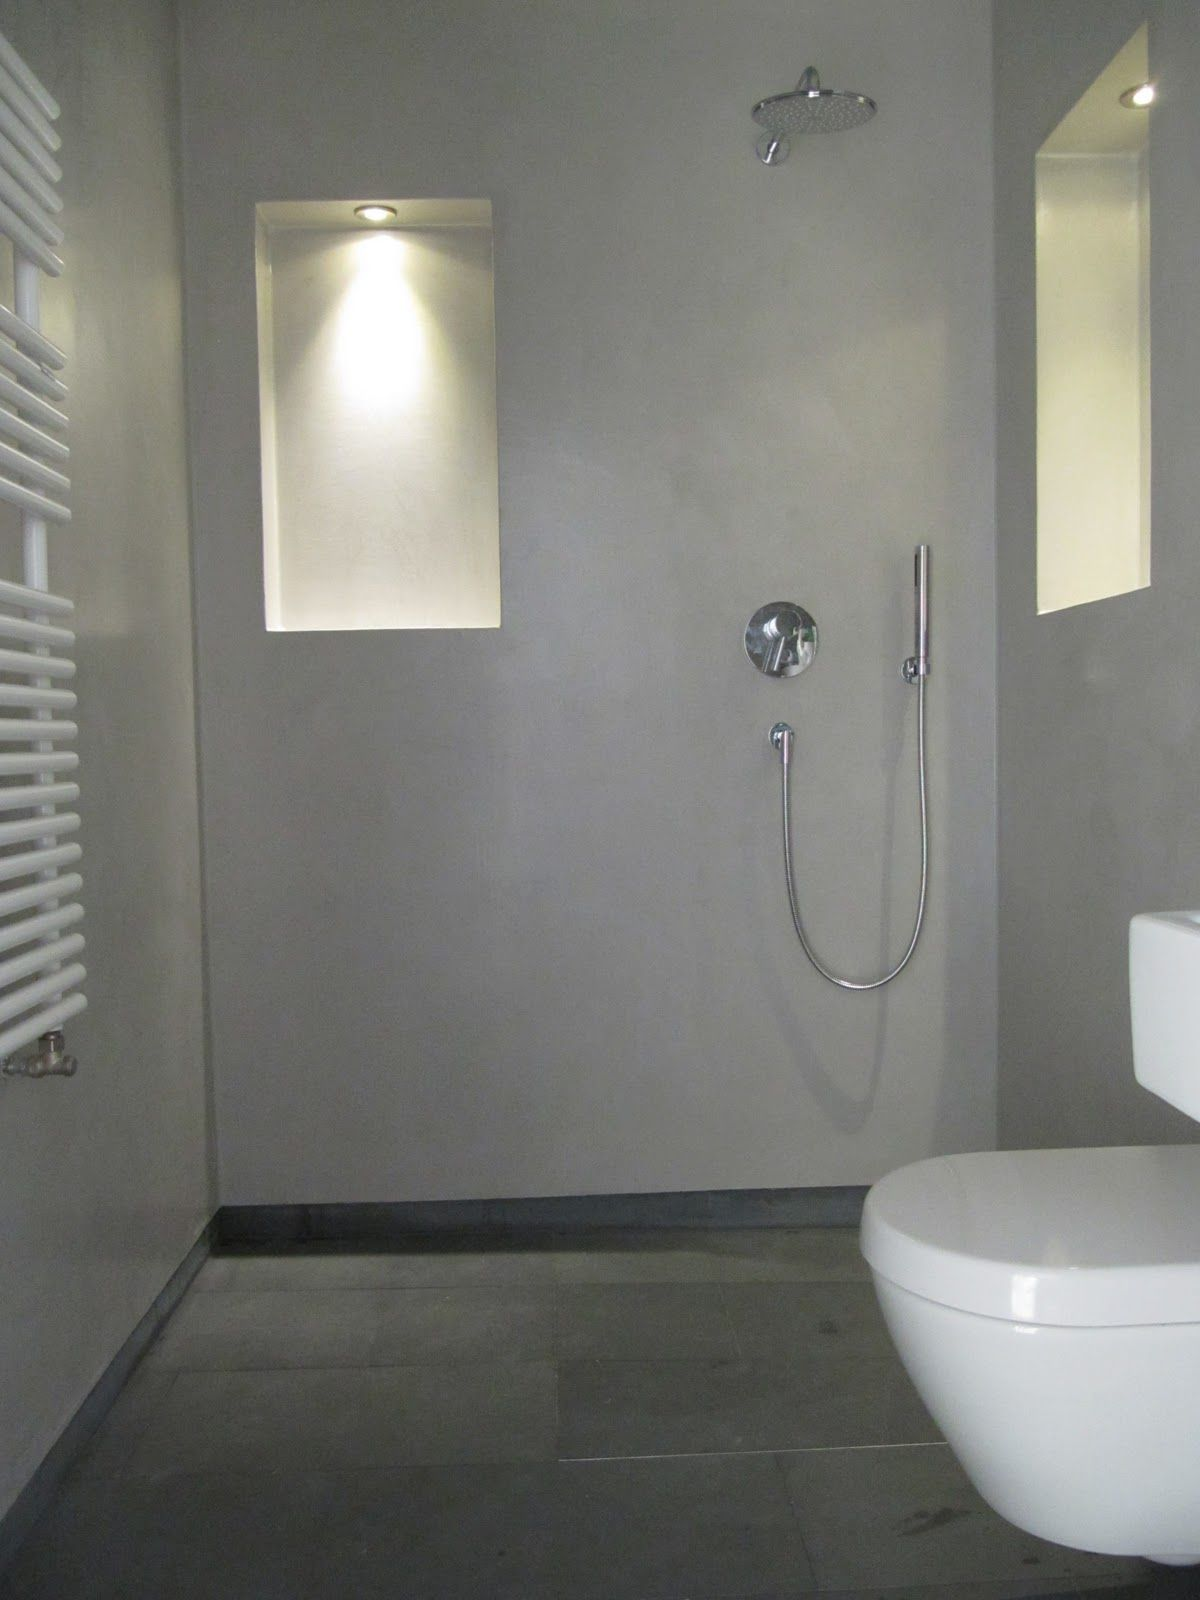 Bodengleiche Dusche   Bäder   Pinterest   Bath and House